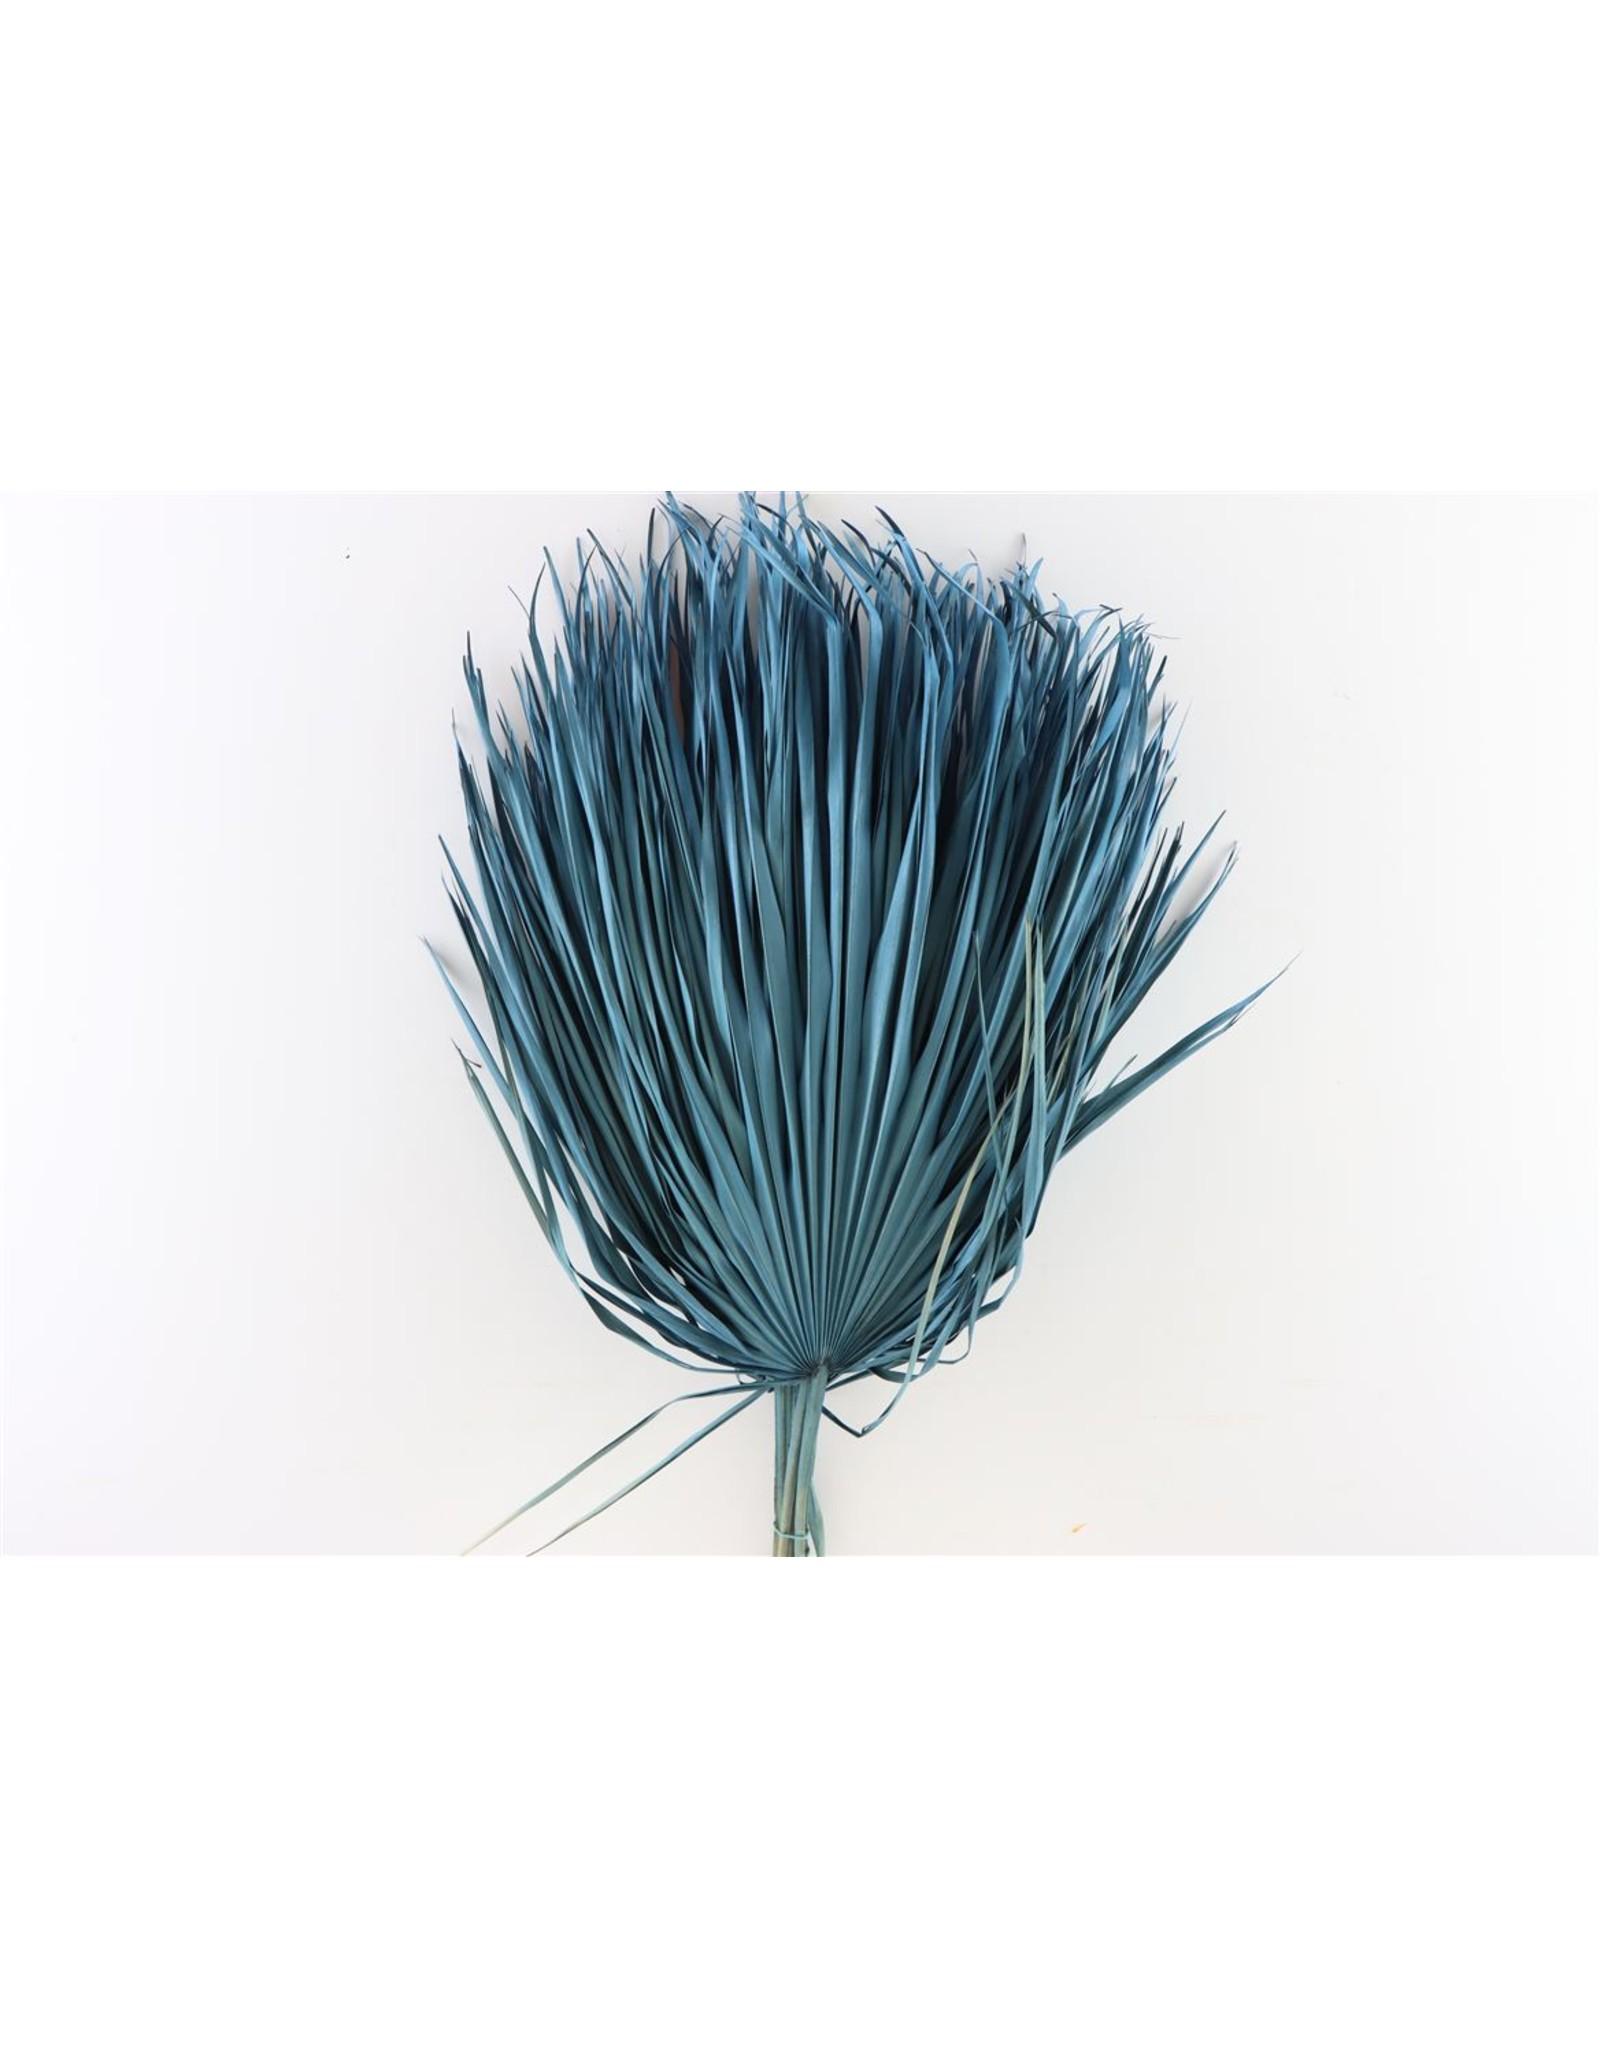 Dried Chamaerops (10tk) Light Blue Bunch x 1